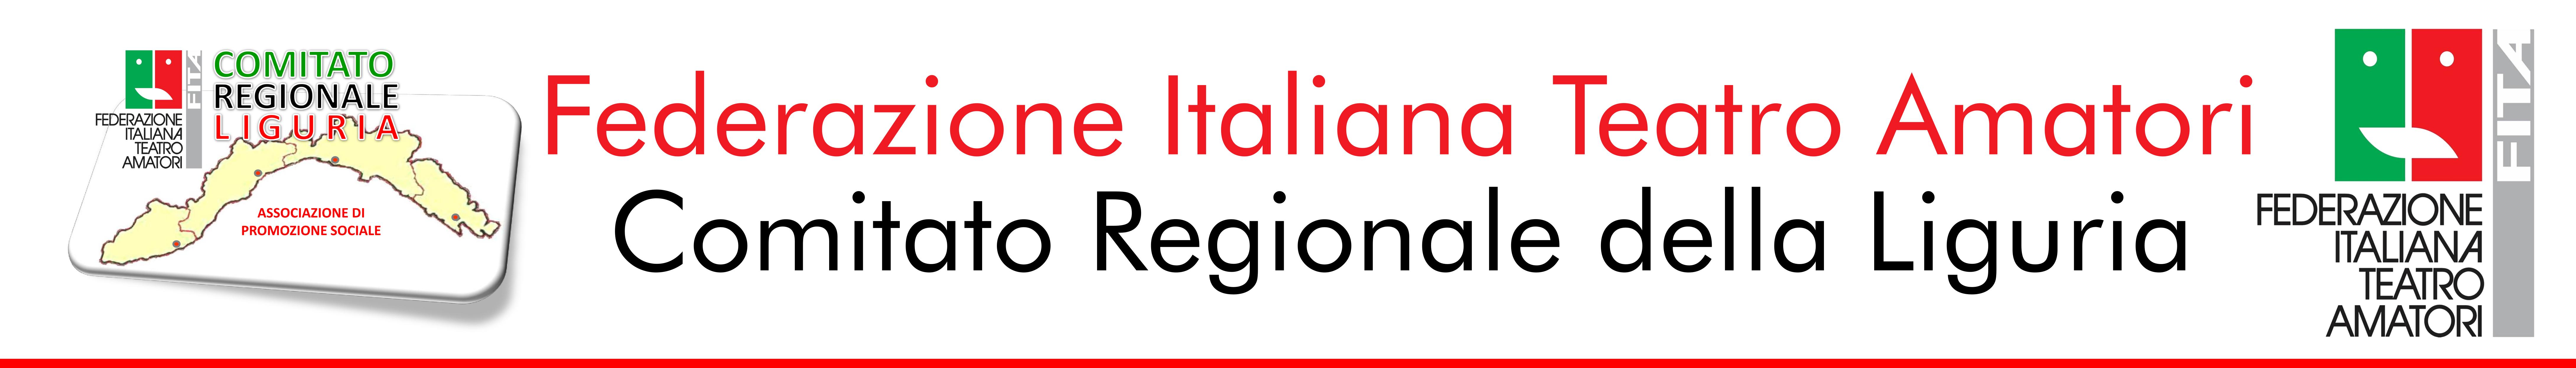 Fita Liguria – Federazione Italiana Teatro Amatori